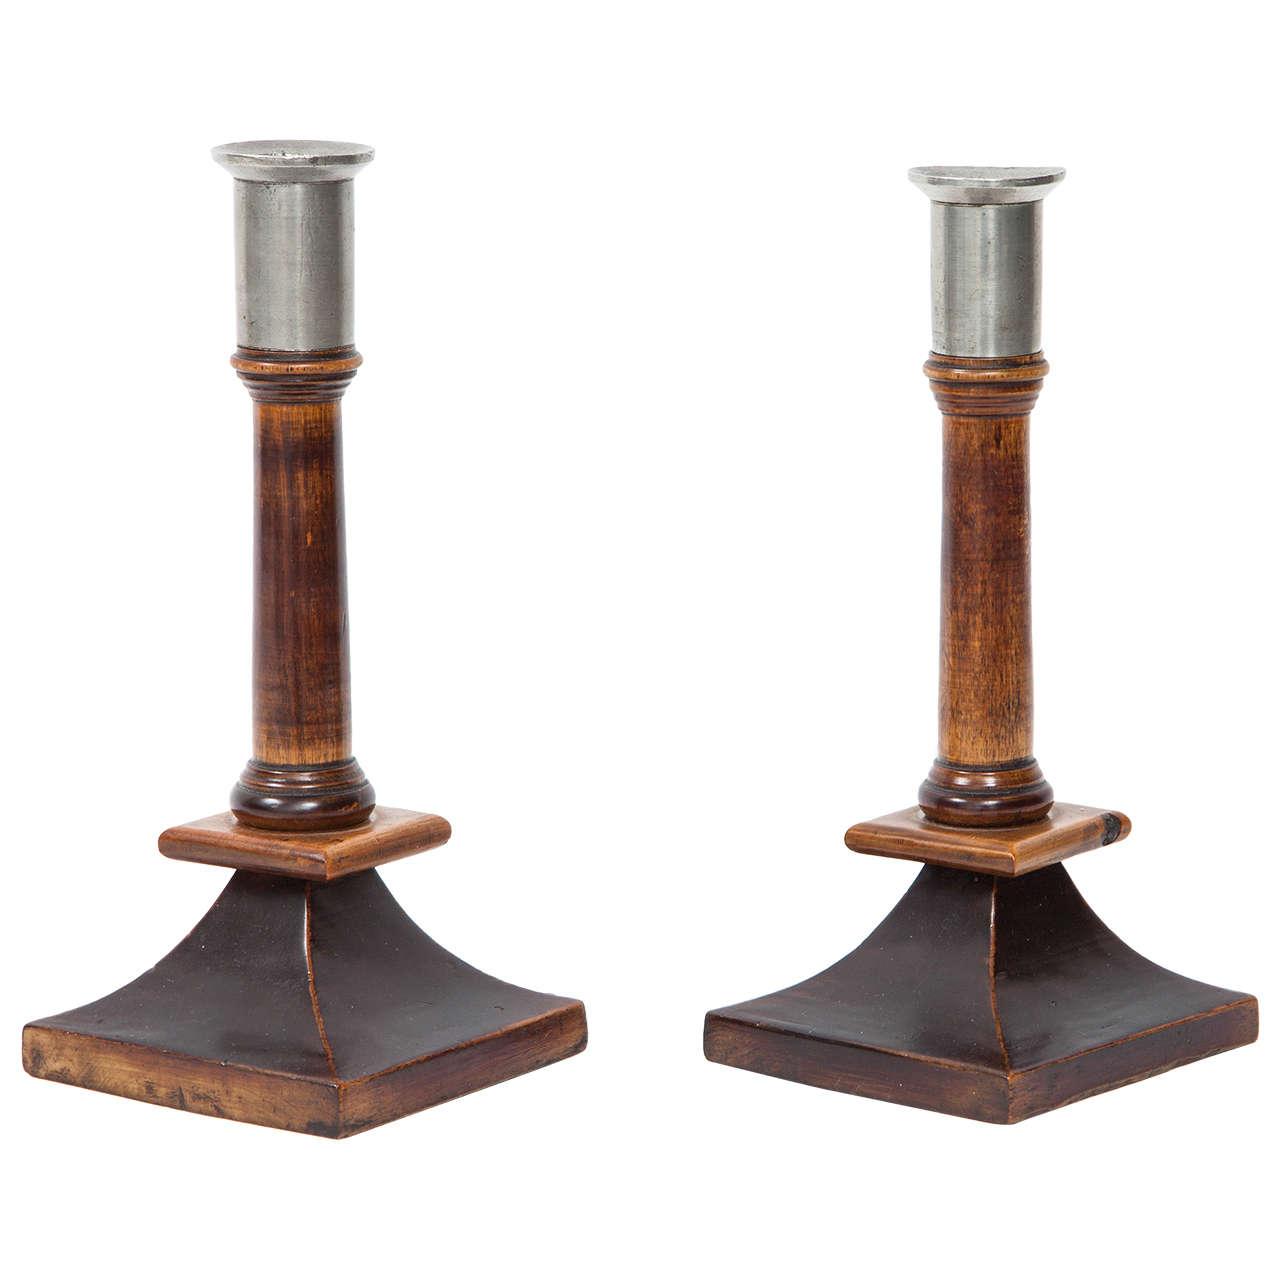 Pair of Swedish Candlesticks